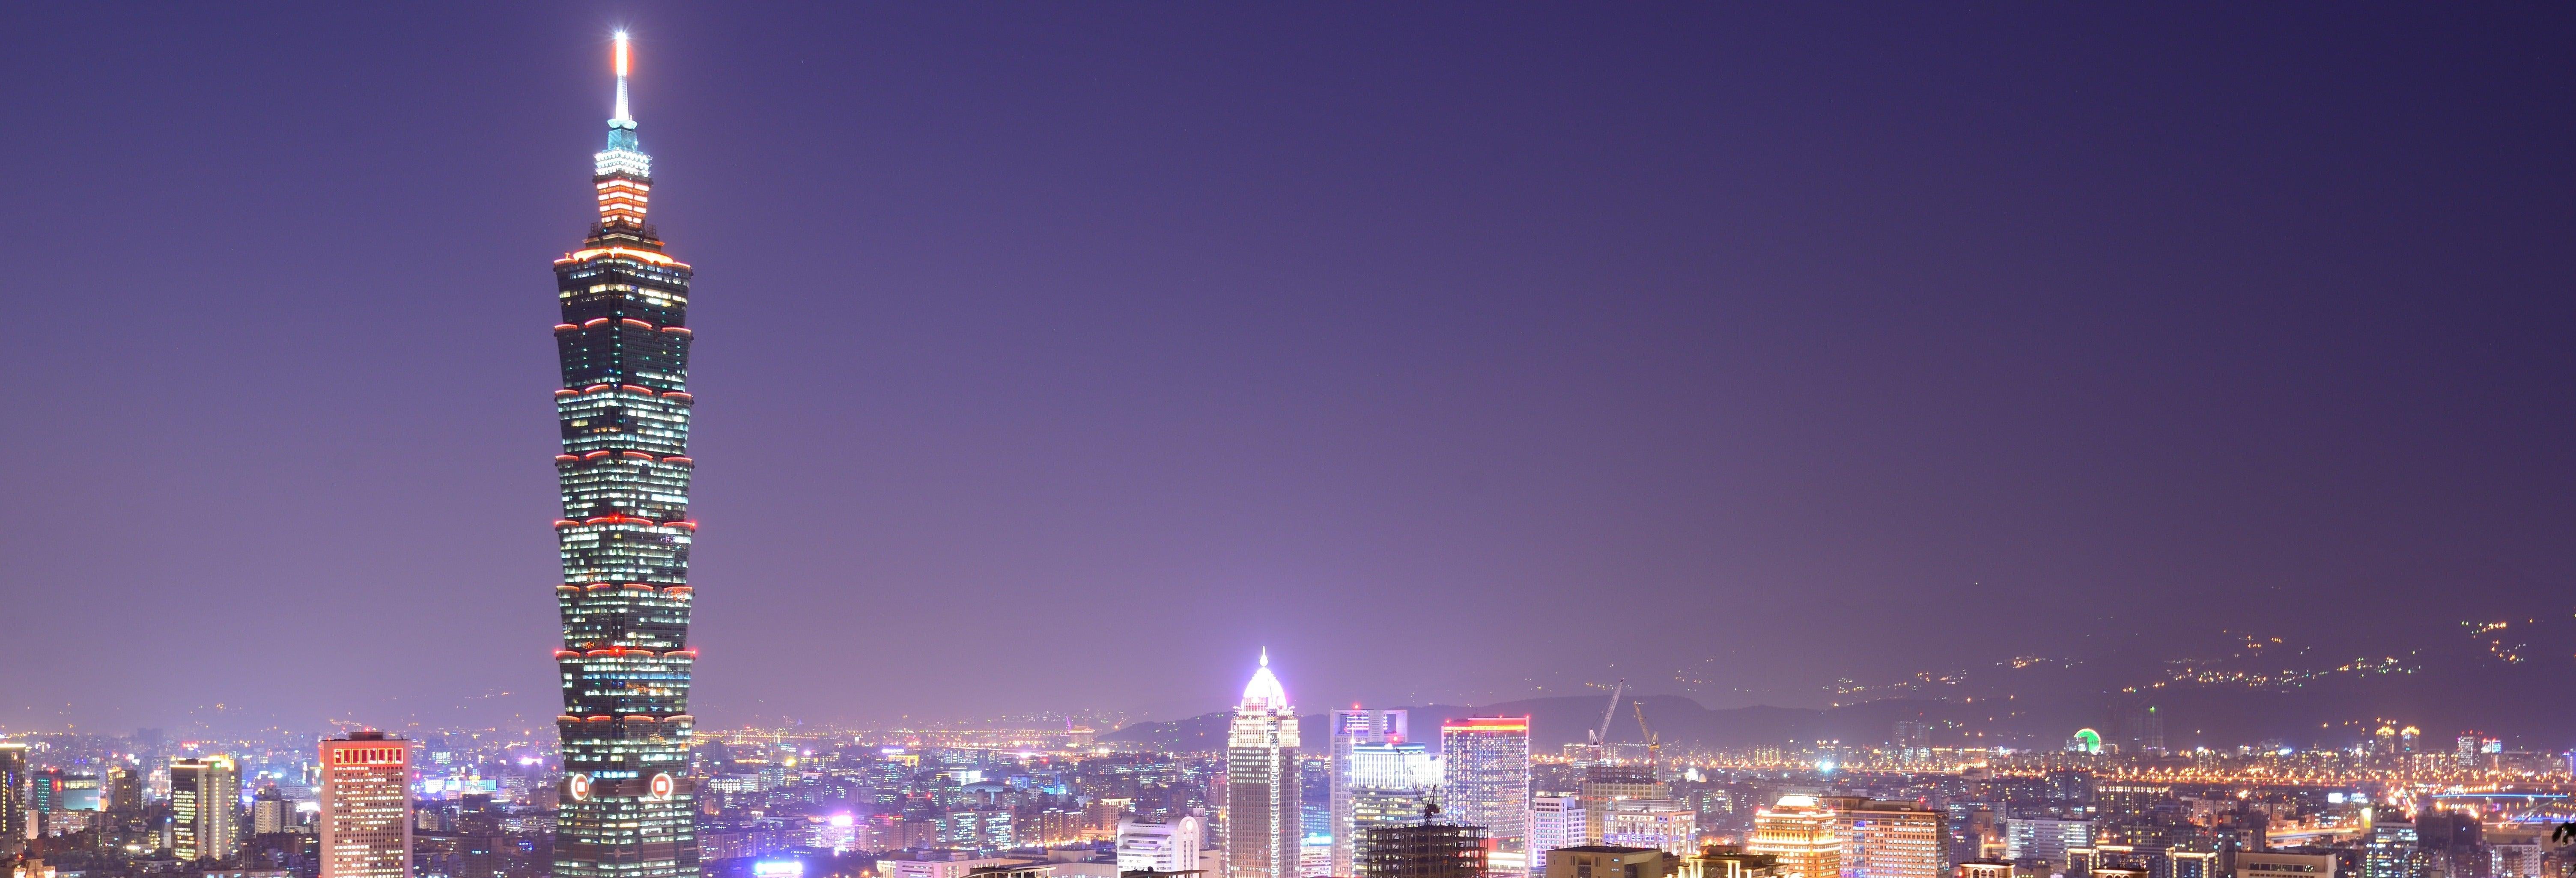 Tour noturno por Taipei